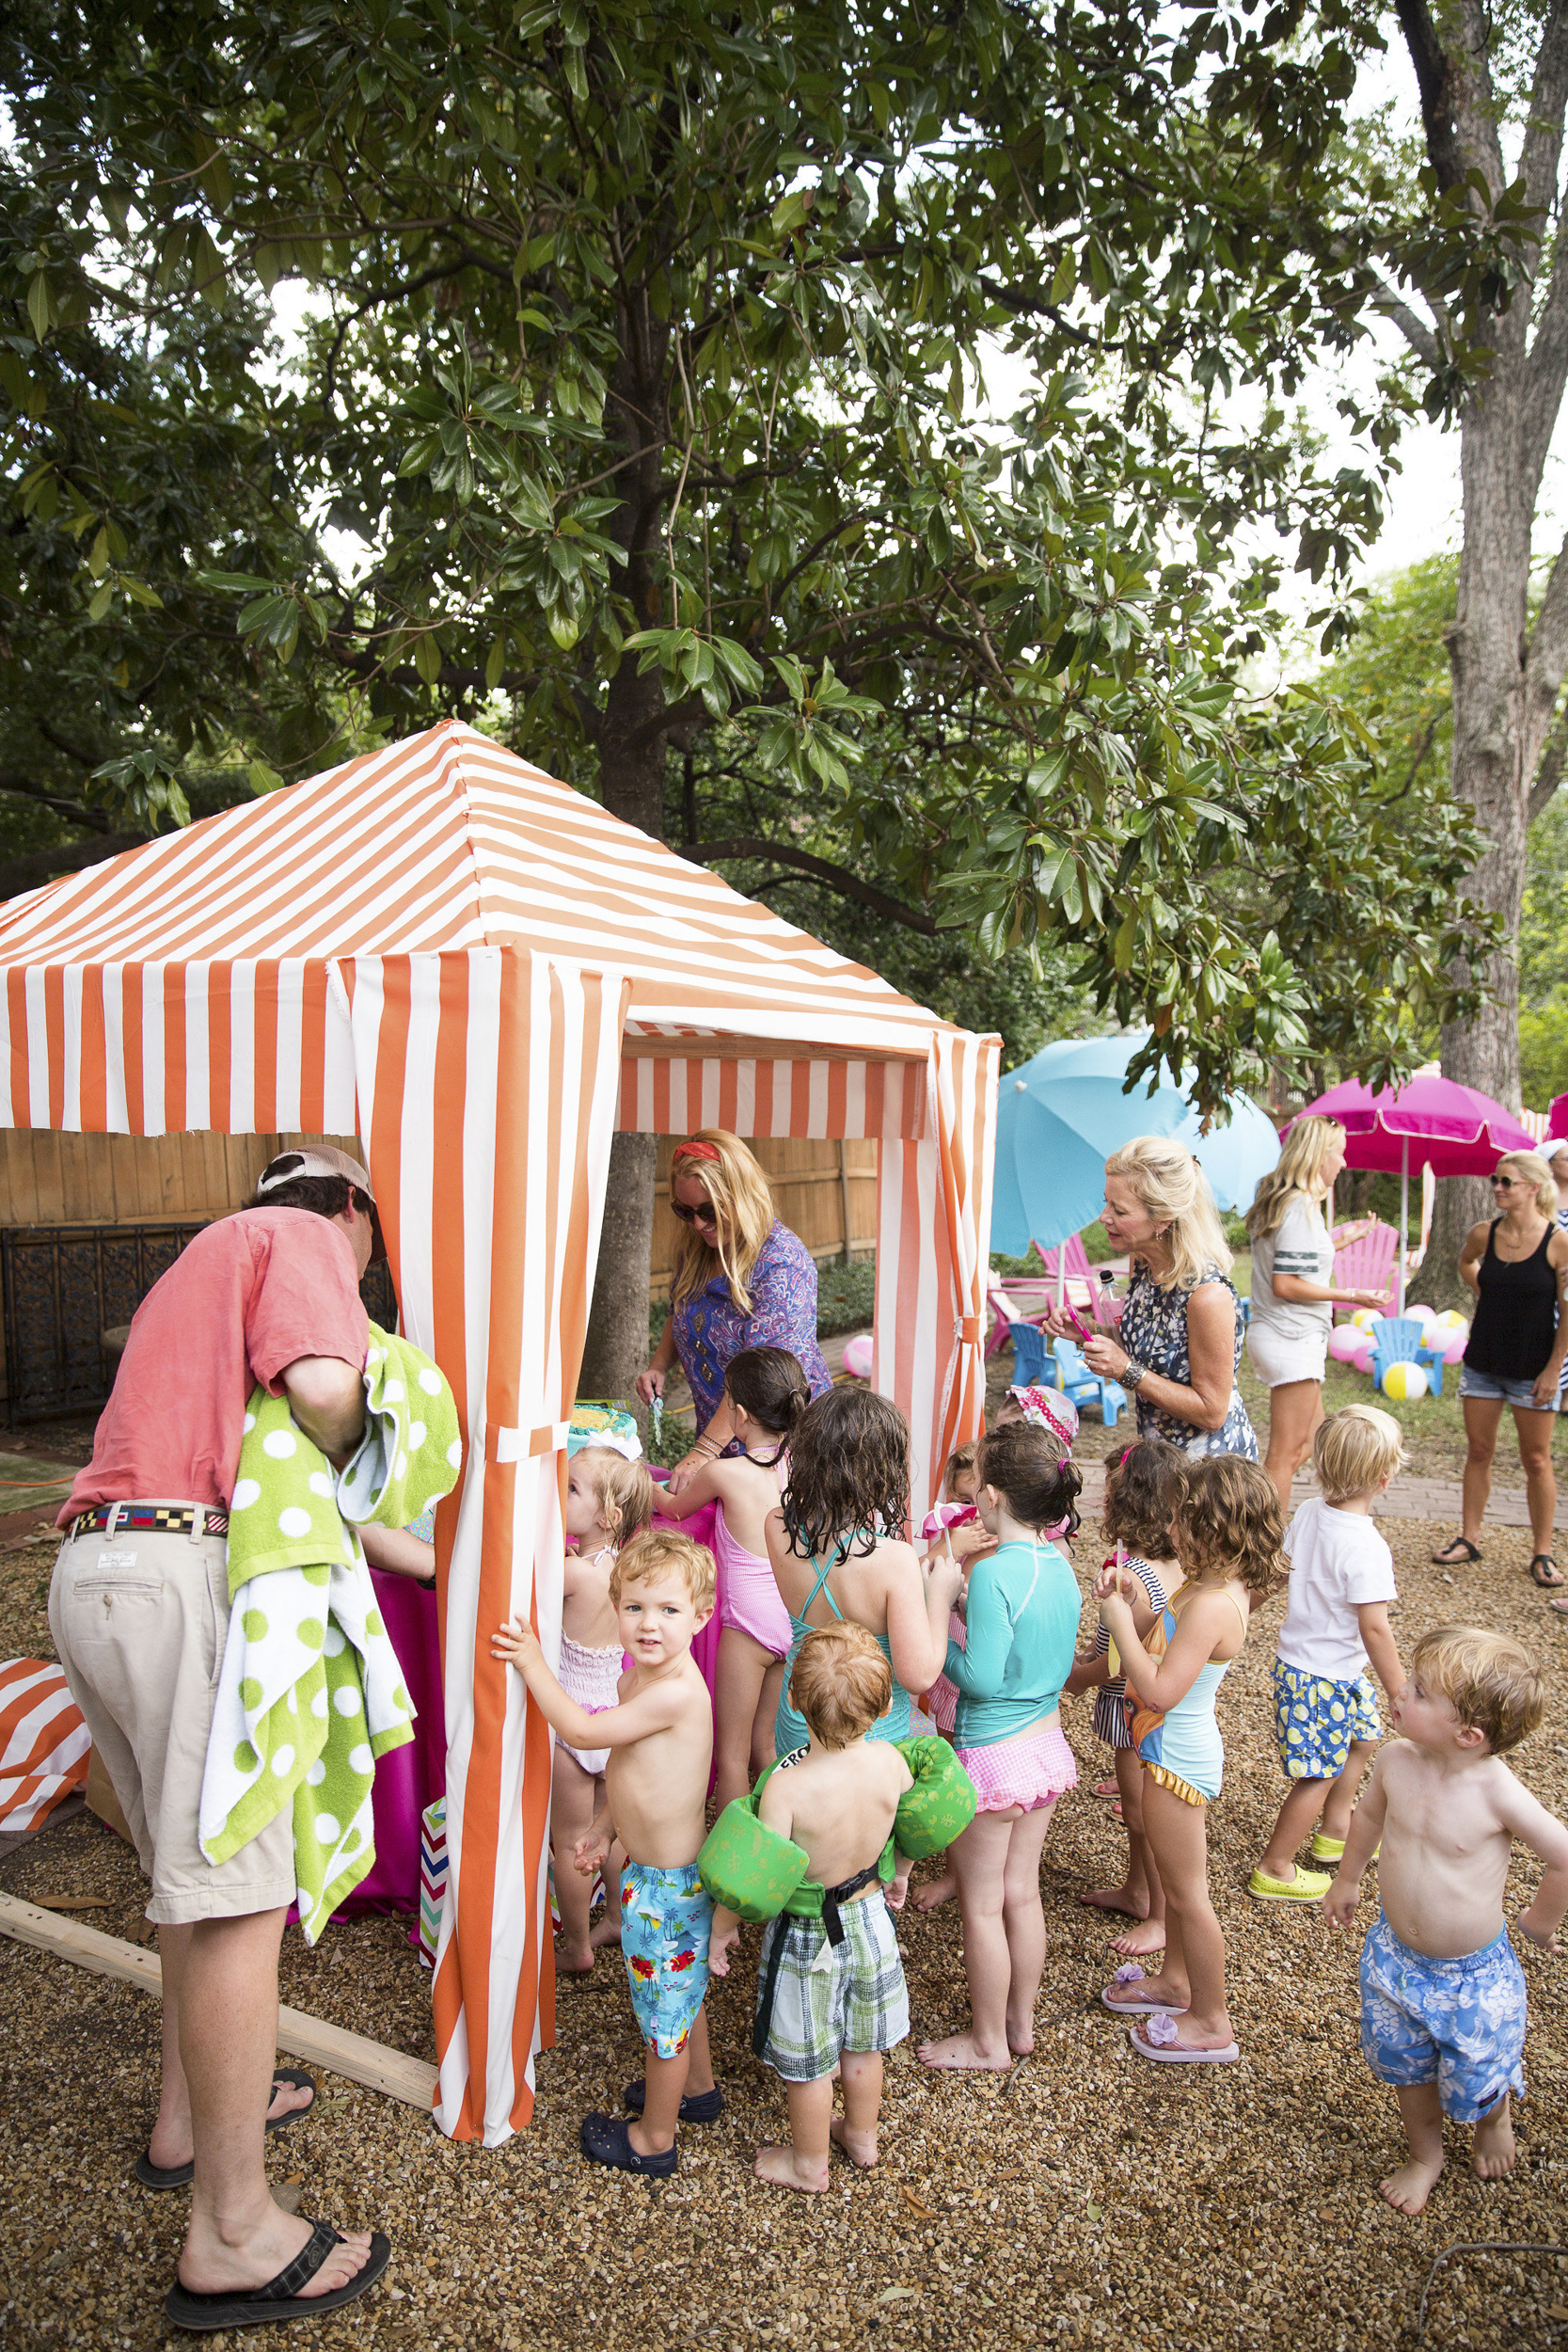 dallas_texas_birthday_party_mae_emily_clarke_events_kids_retro_pool_swim_endless_summer_invitations_ceci_new_york_watercolor_illustration_decor-31.jpg